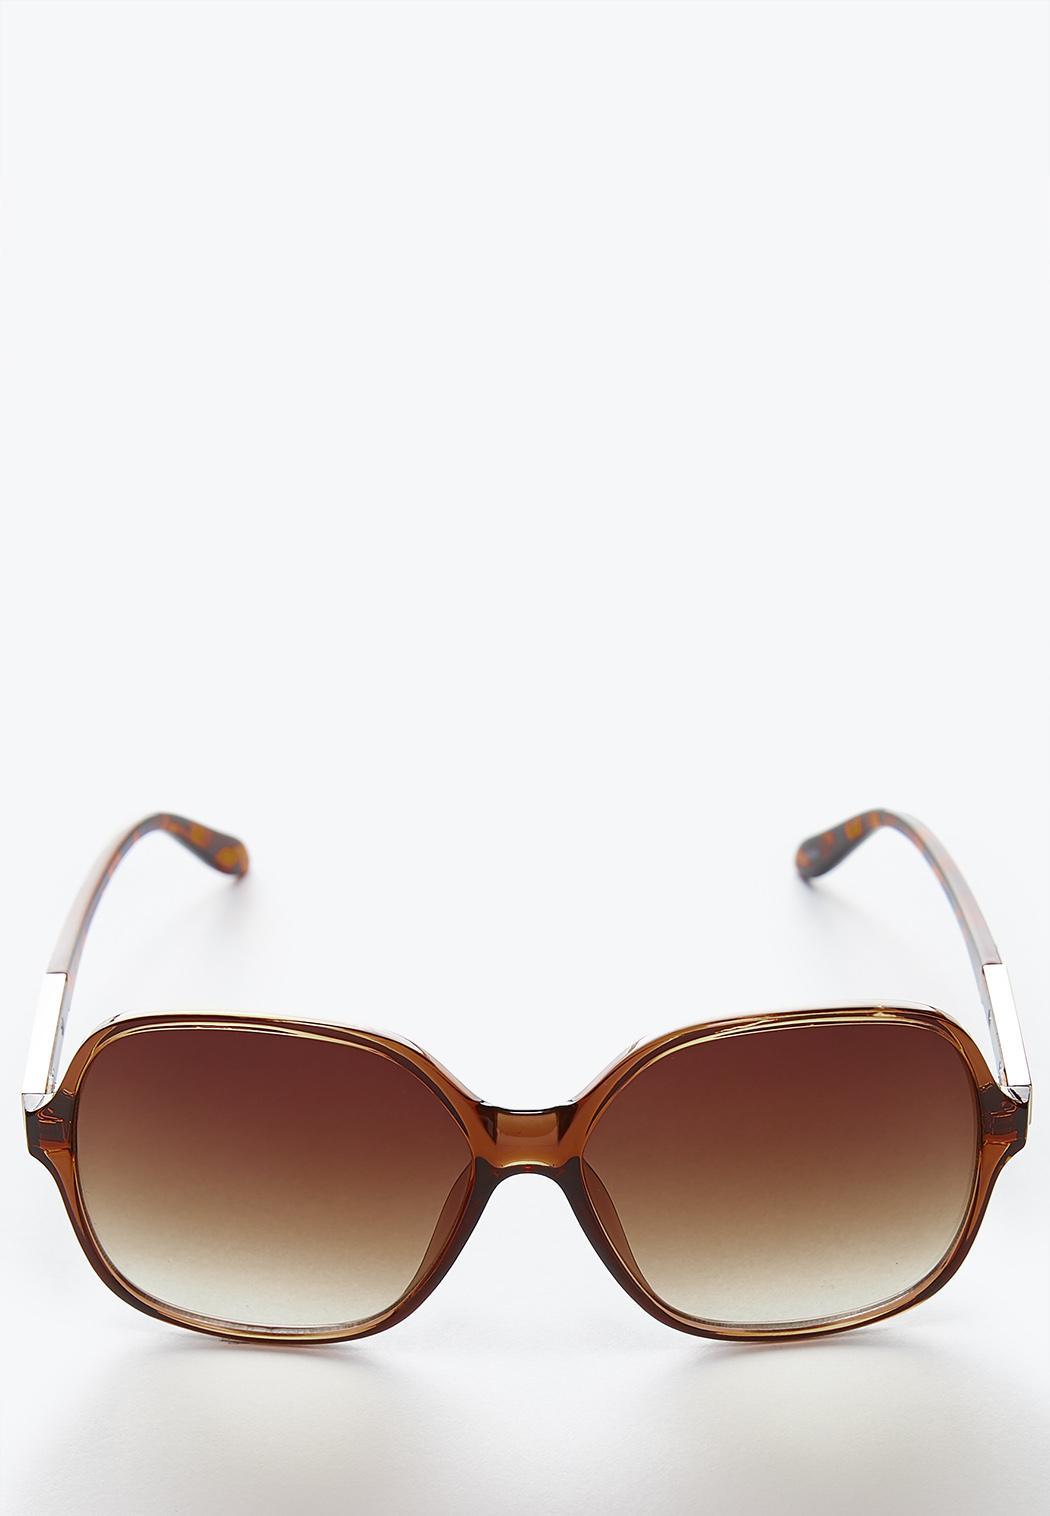 408fda8804 Tortoise Square Sunglasses Sunglasses Cato Fashions